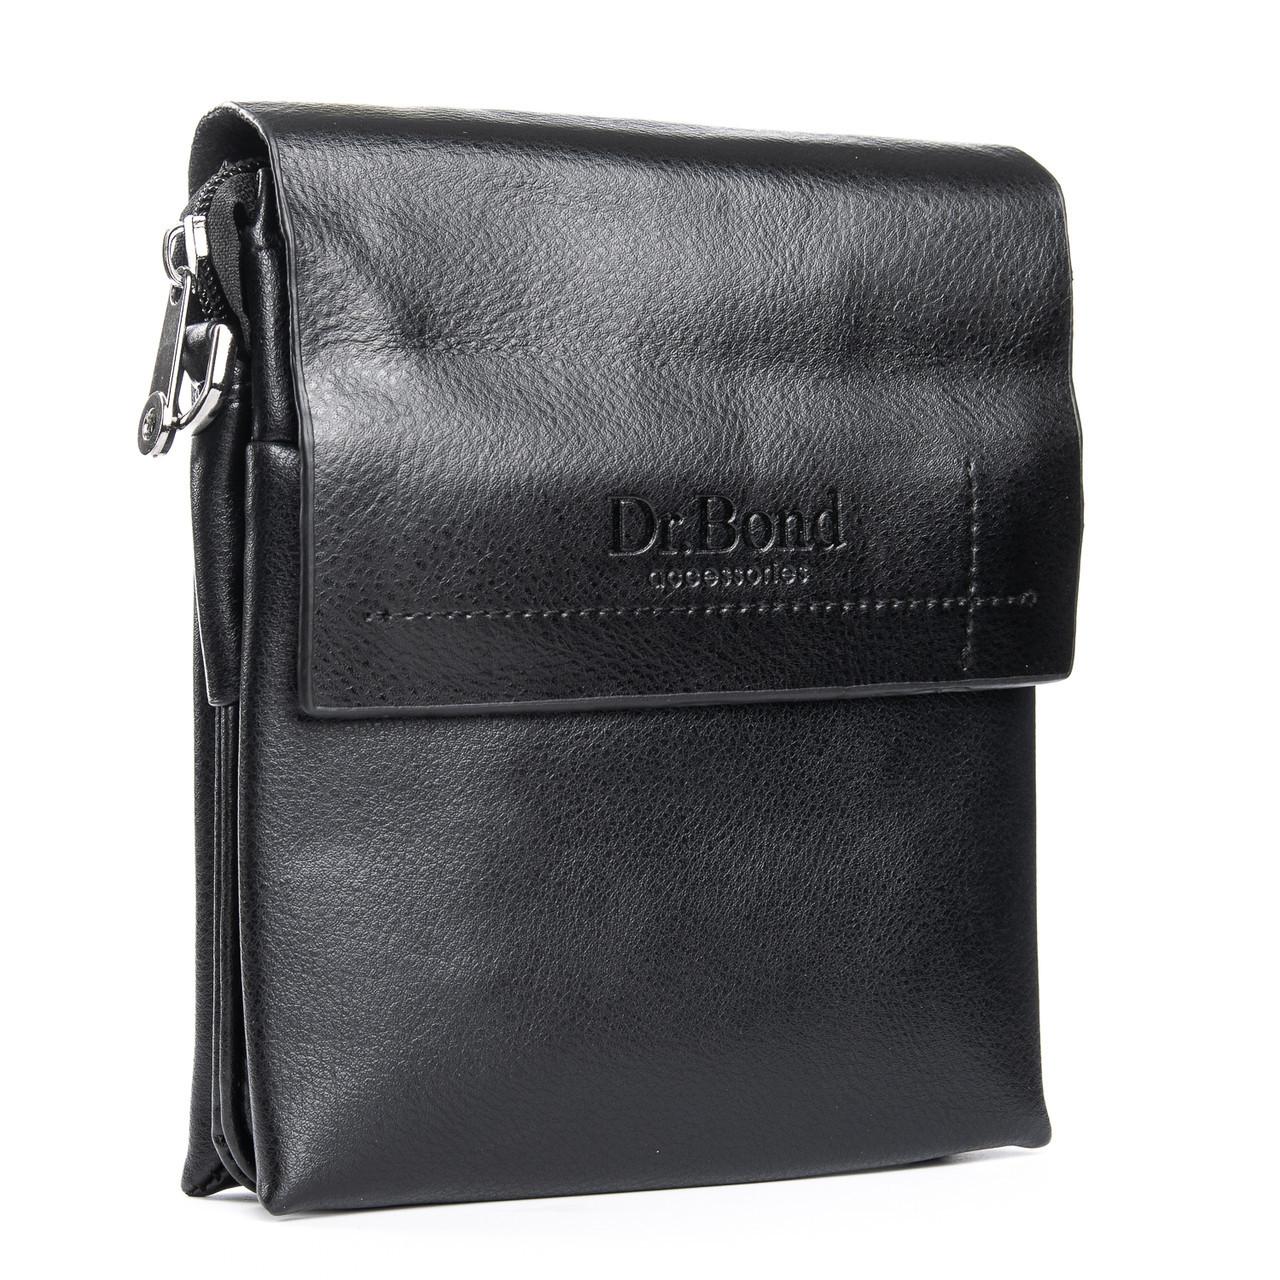 Сумка Мужская Планшет иск-кожа Dr. Bond GL 206-0 black